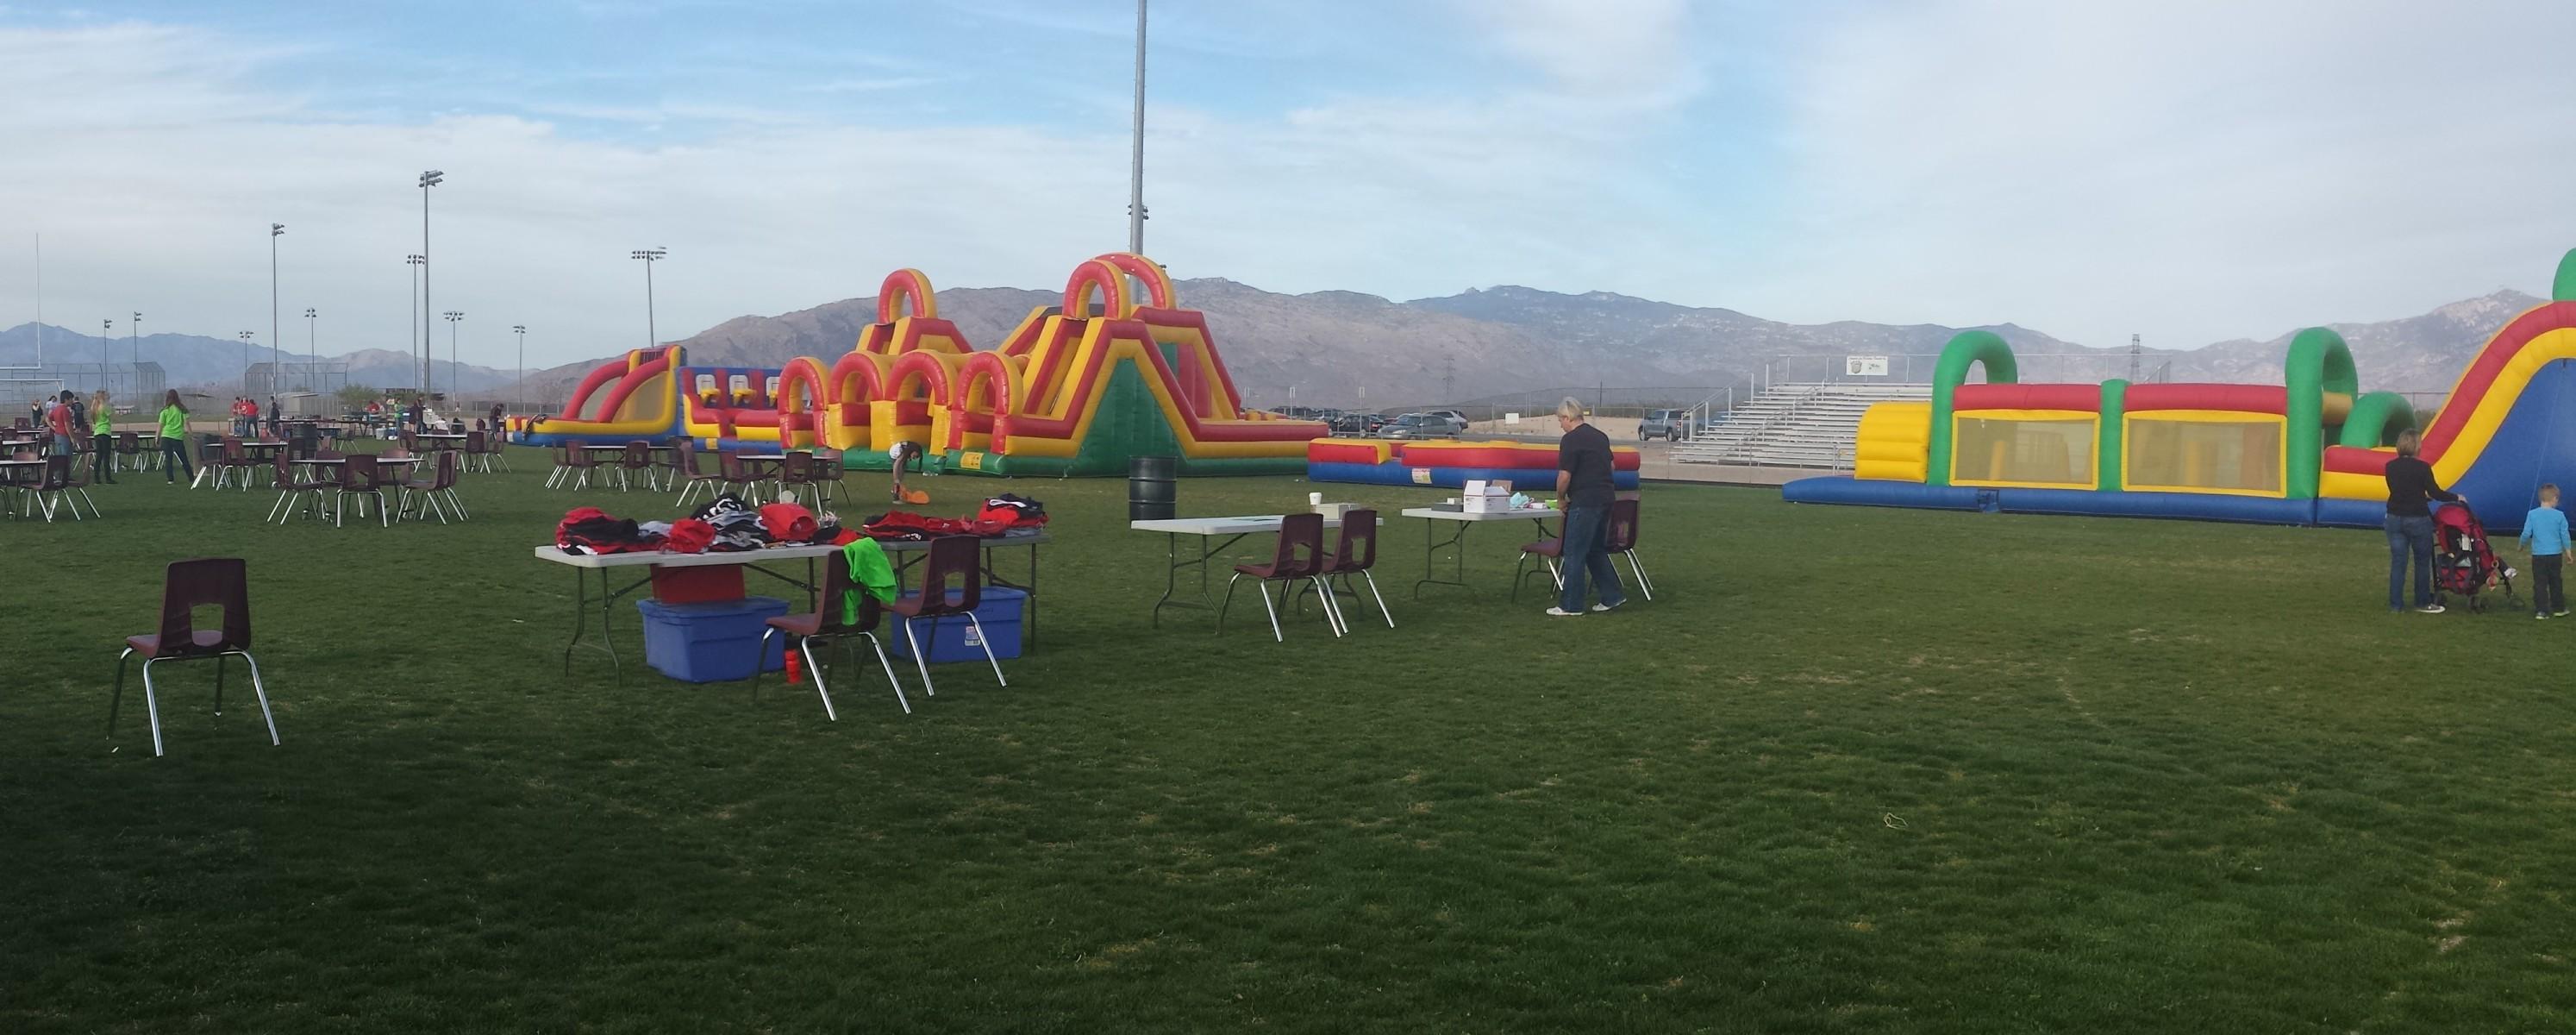 Event: Cienega High School